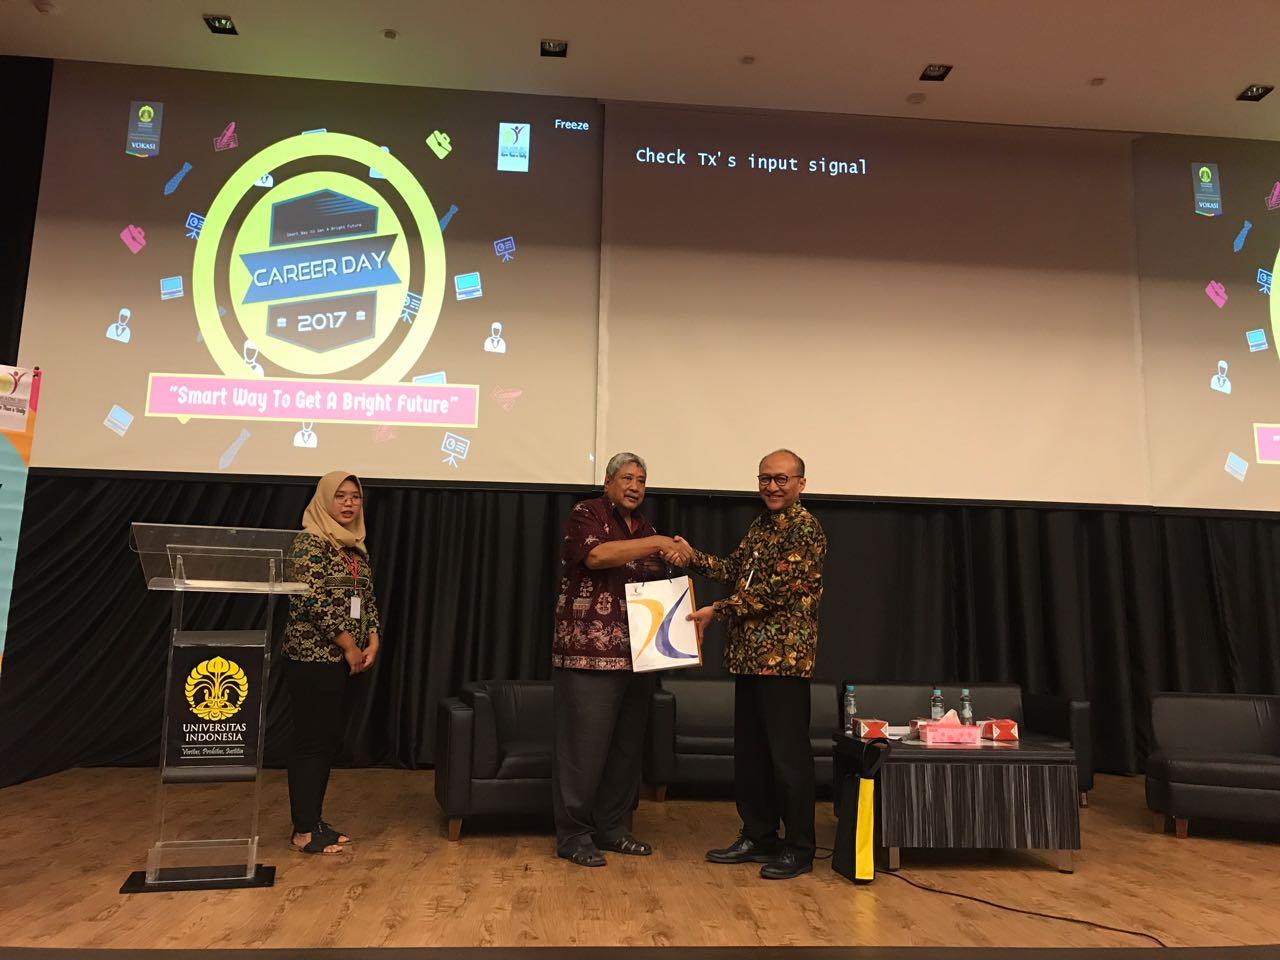 CEO Taspen Life Berikan Literasi Bagi Mahasiwa Program Vokasi Universitas Indonesia